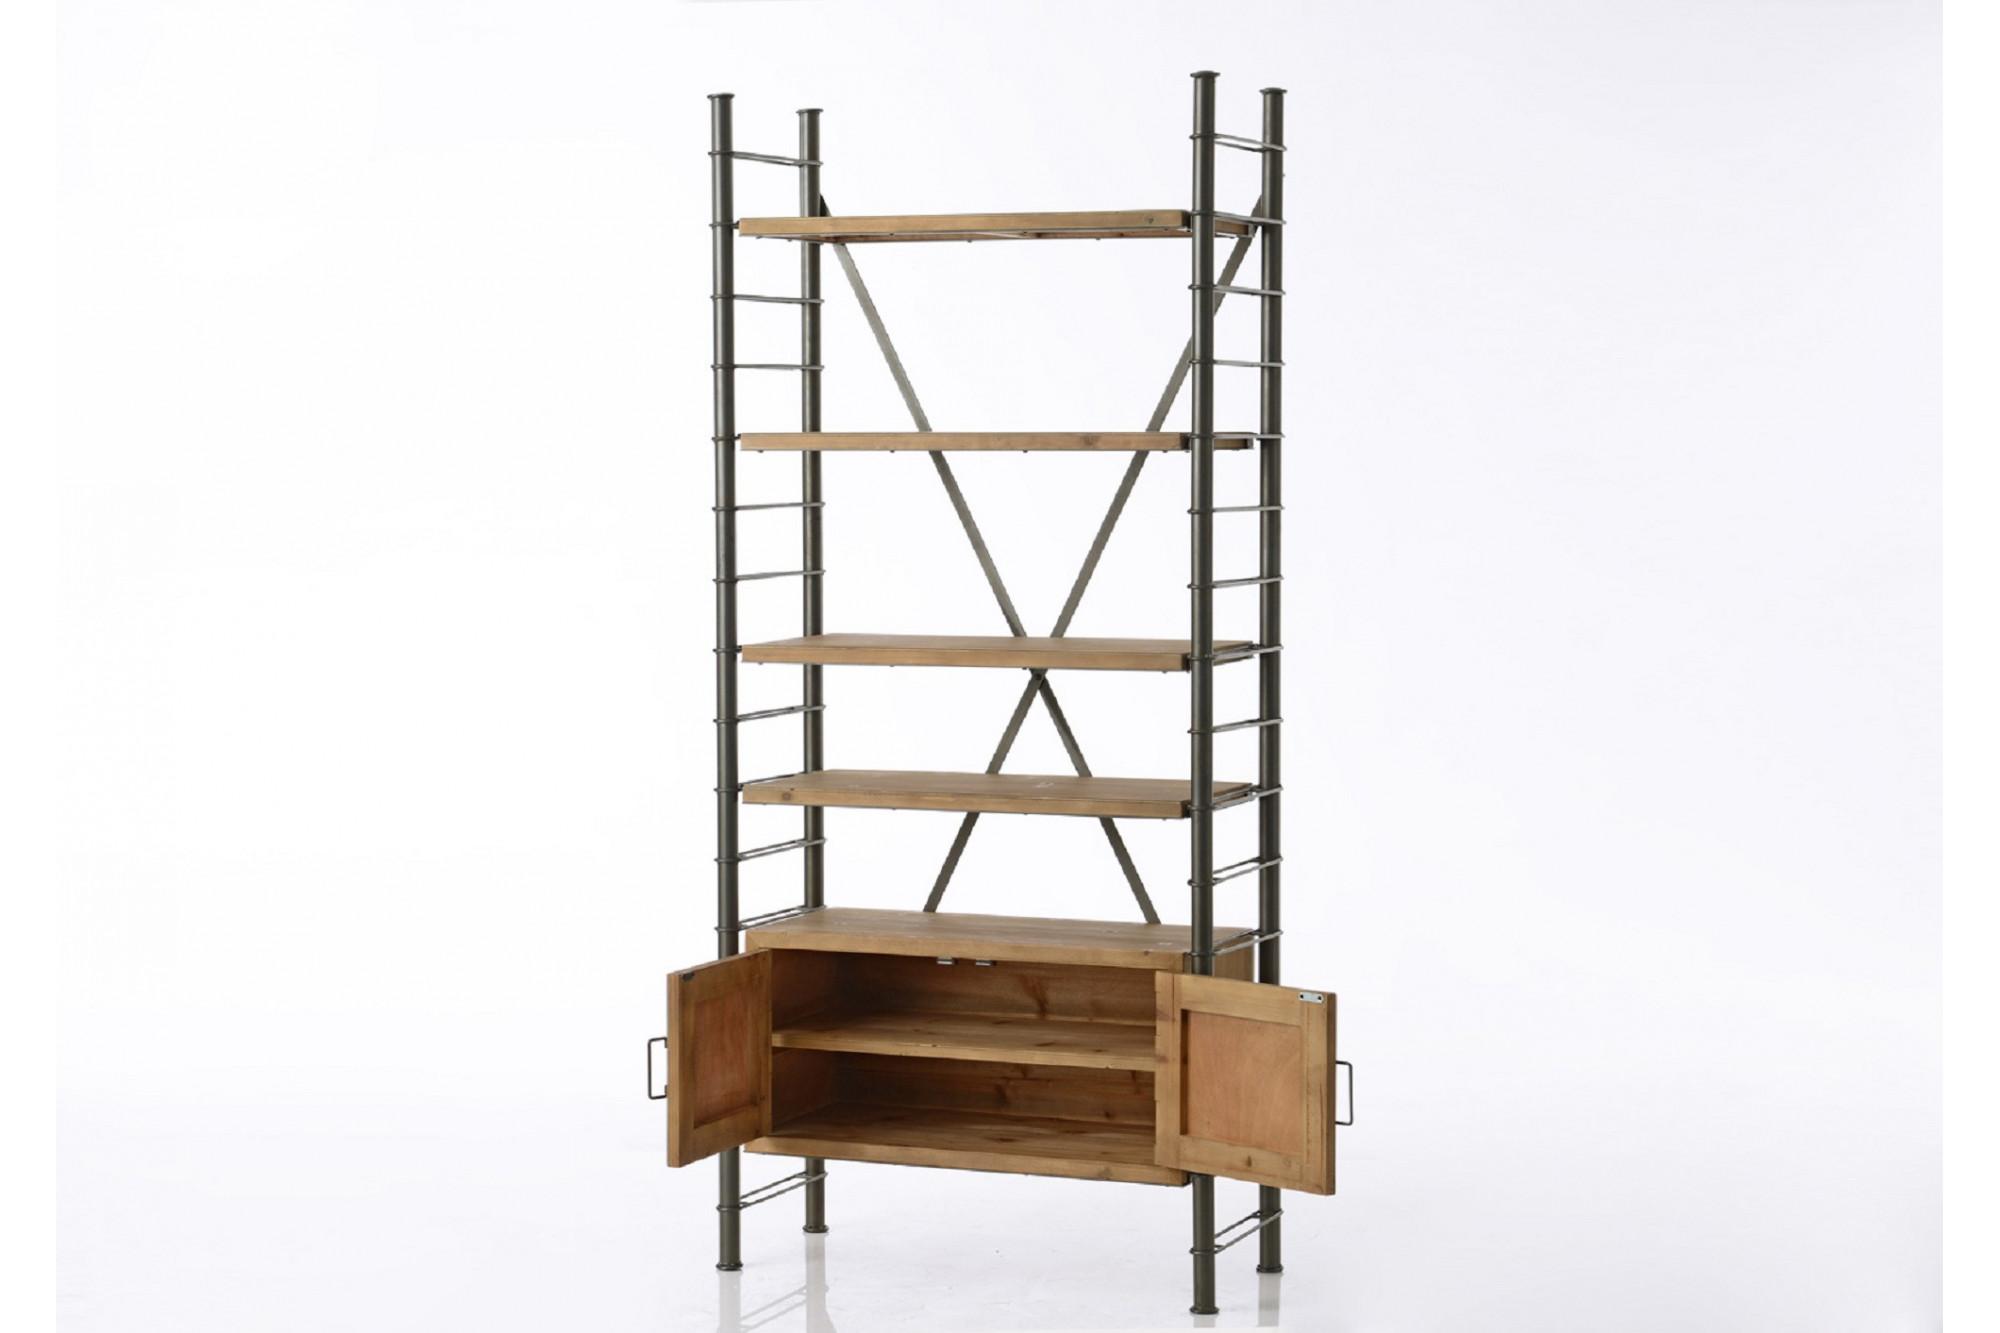 biblioth que modulable en m tal et bois hellin. Black Bedroom Furniture Sets. Home Design Ideas